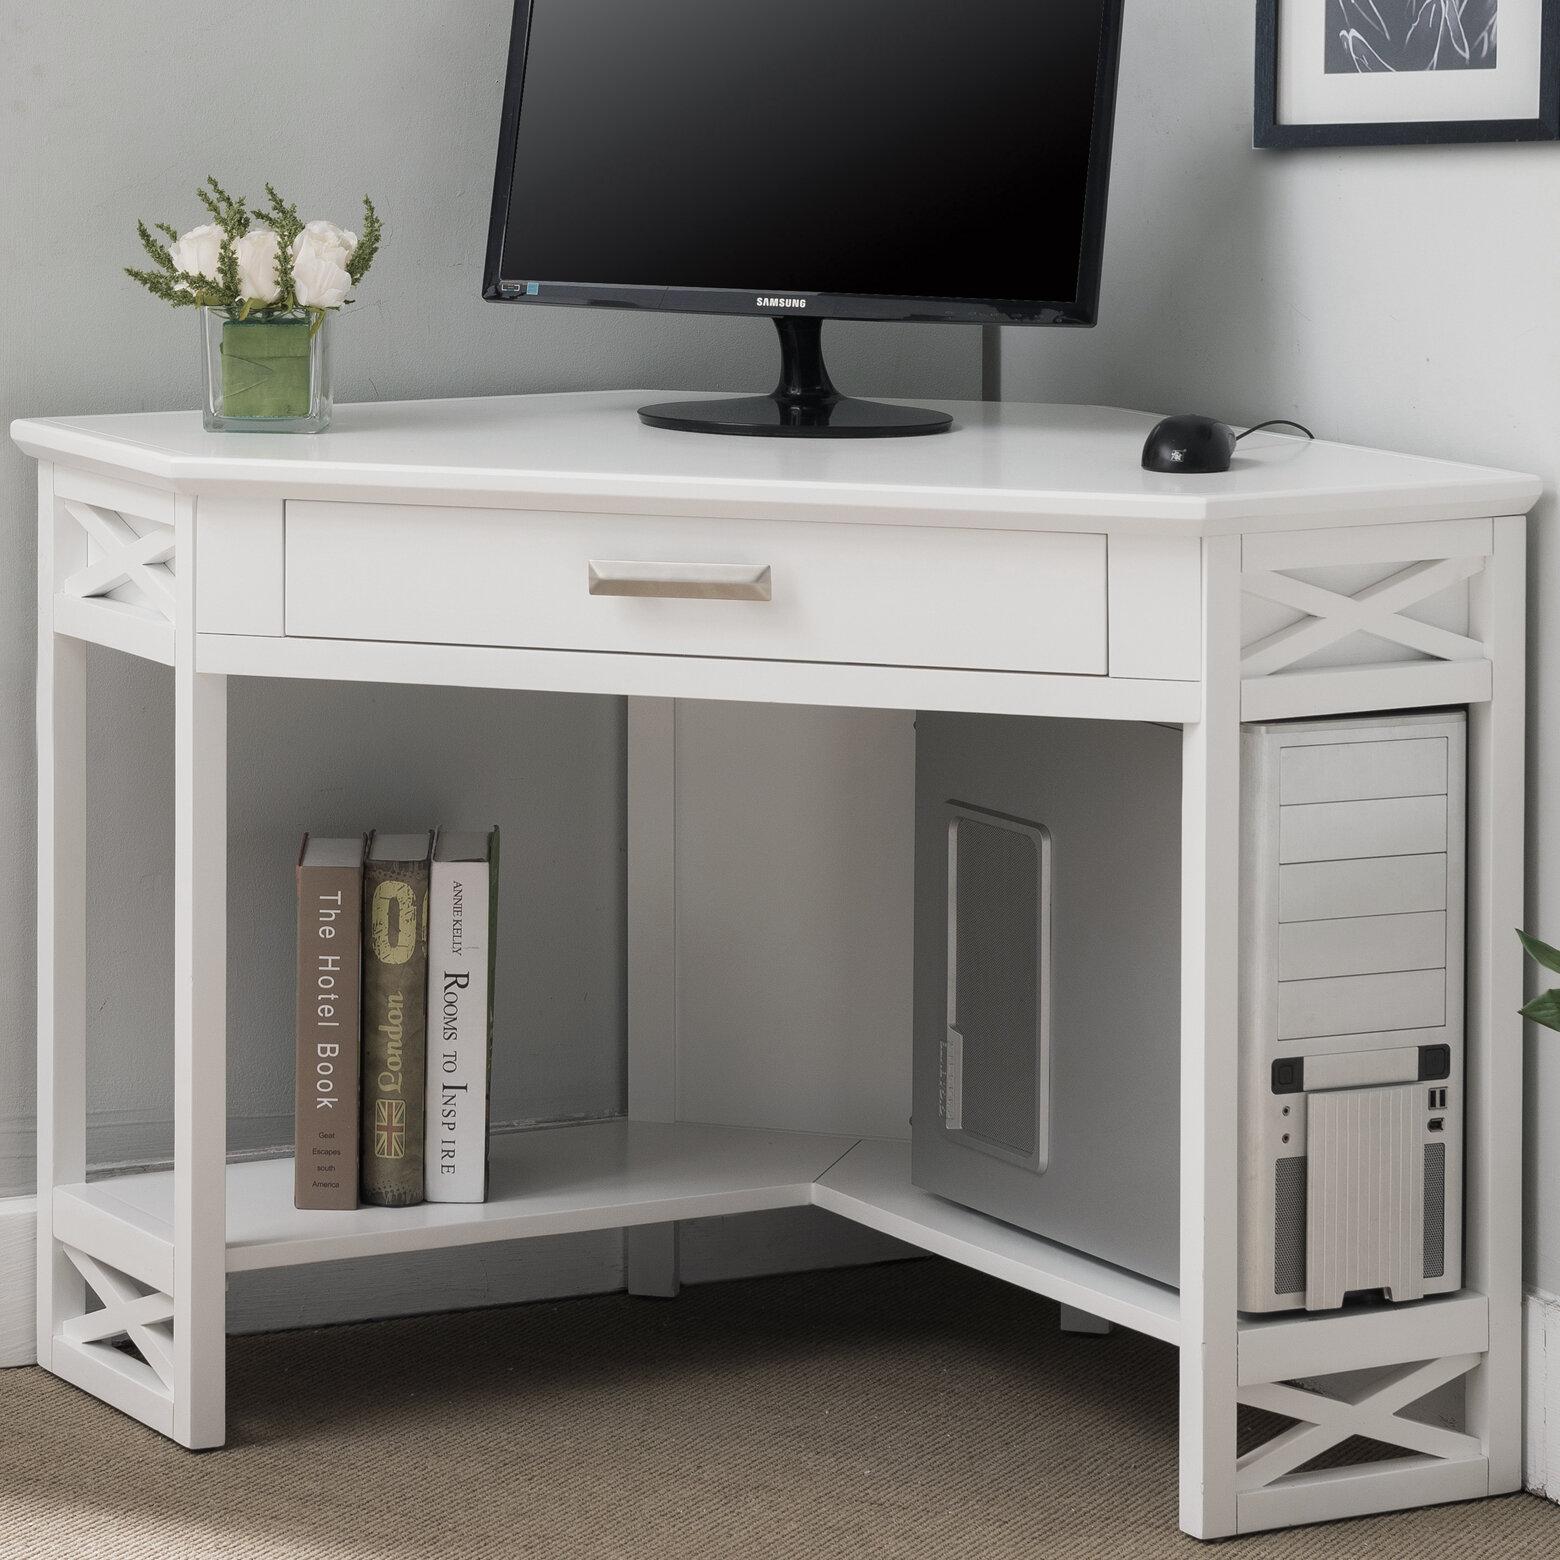 Image of: Breakwater Bay Moorton Corner Desk Reviews Wayfair